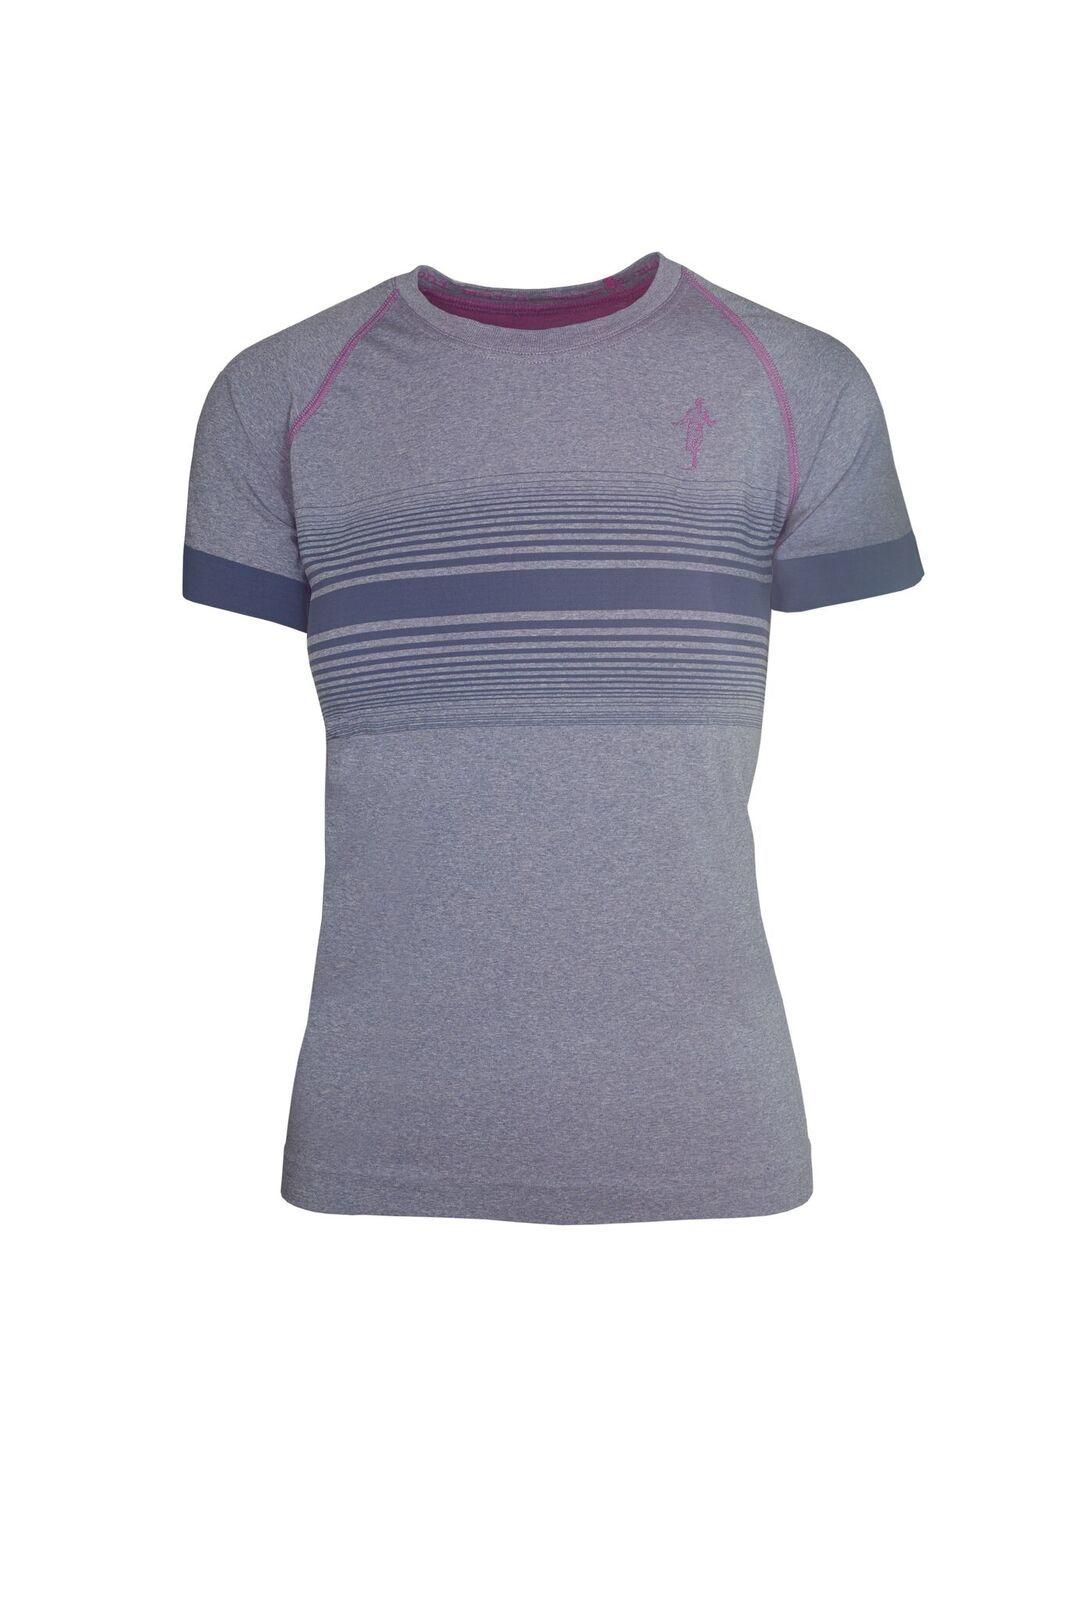 Thonimara Damen Shirt Breeze in Light Carbon